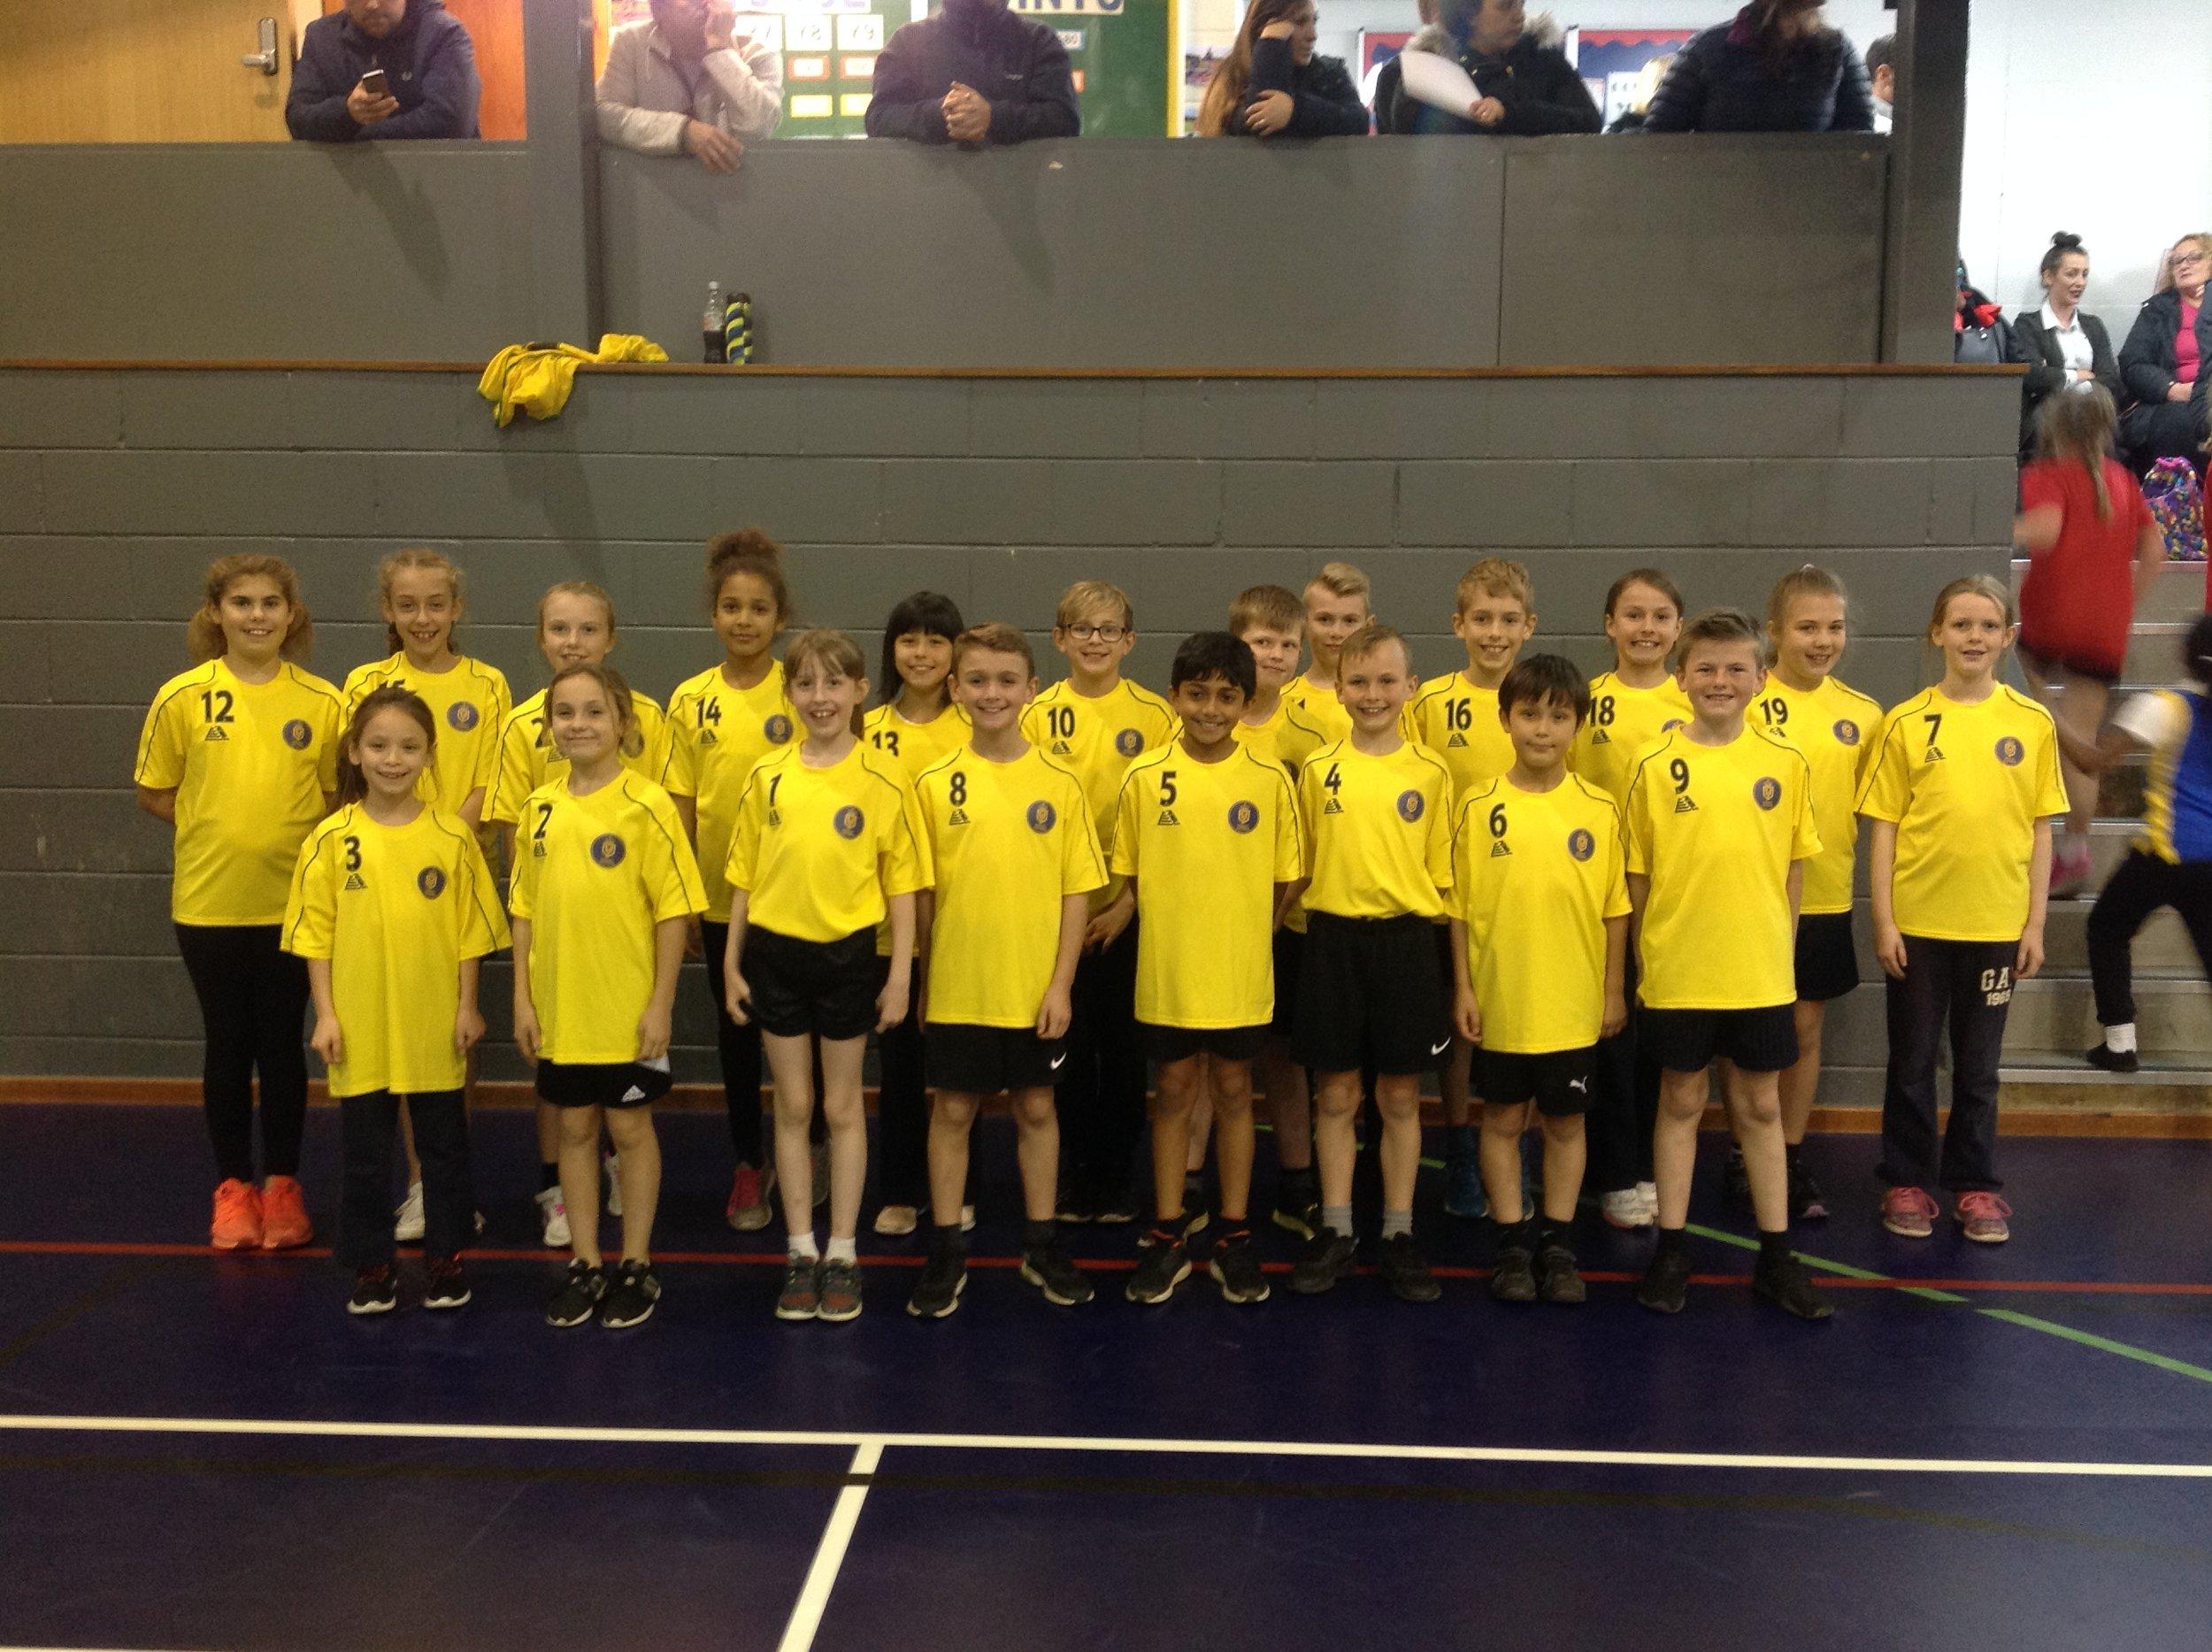 Morley Victoria Primary